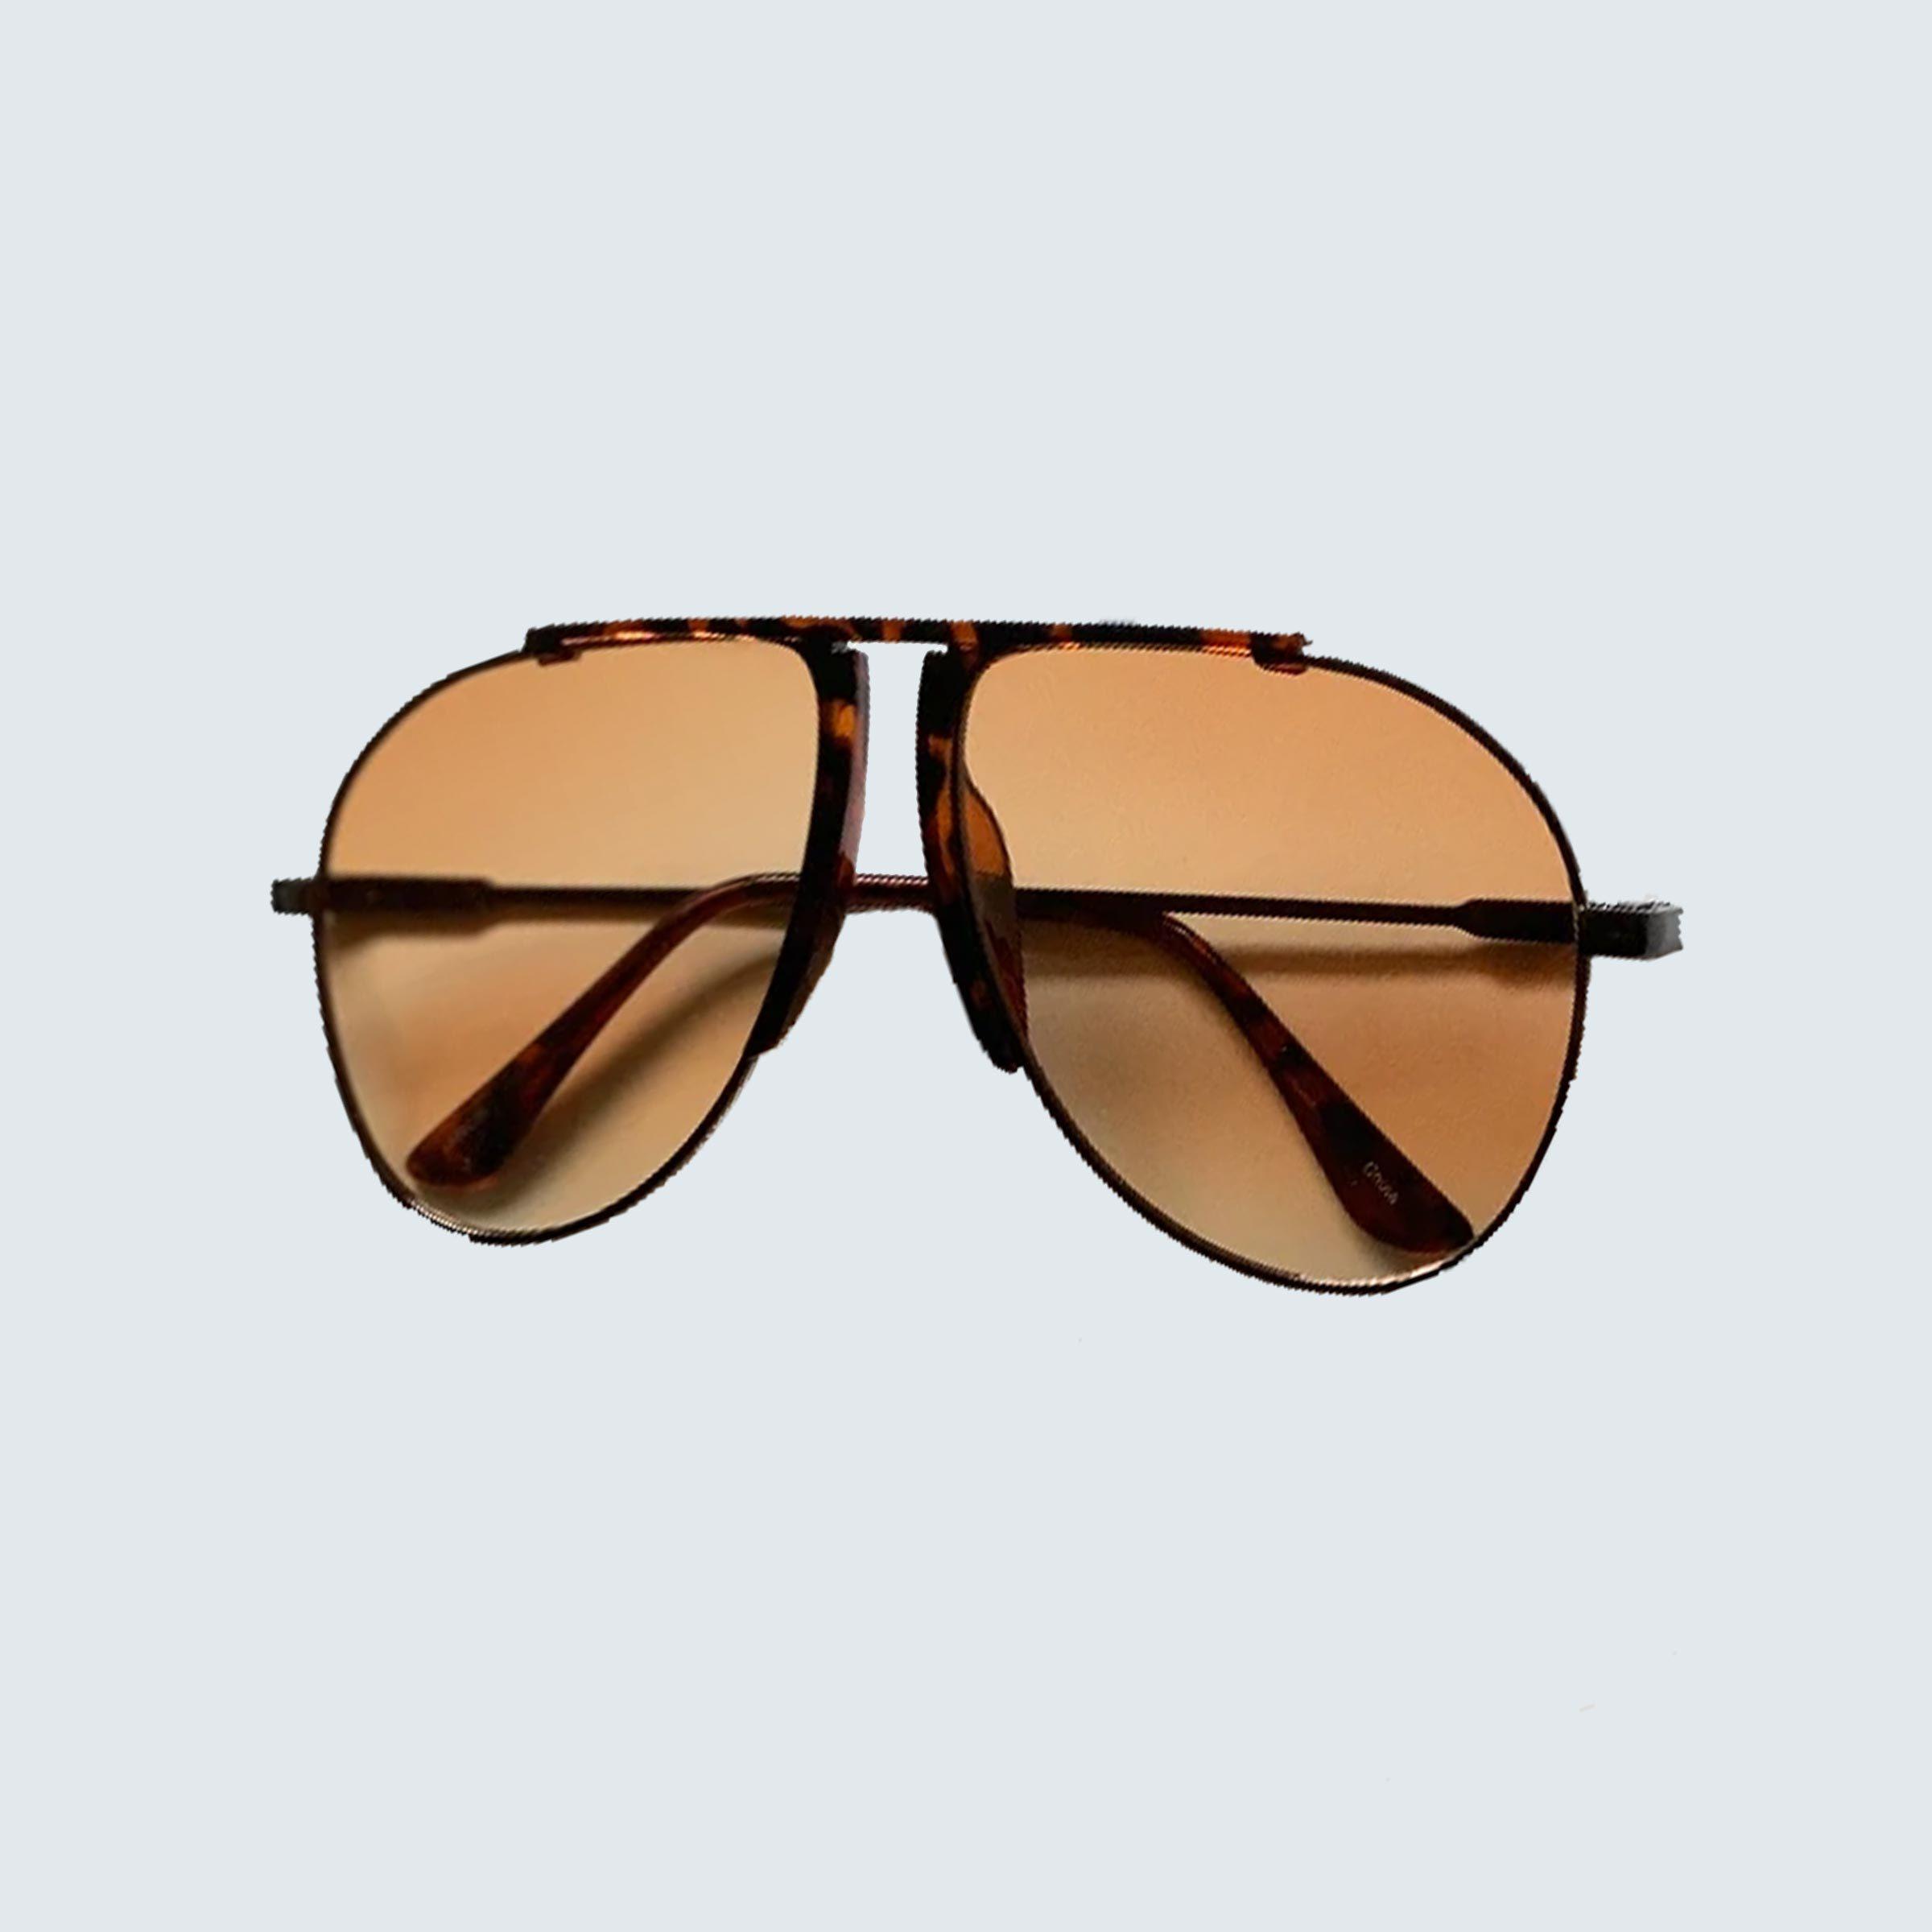 Best cheap sunglasses for aviator fans